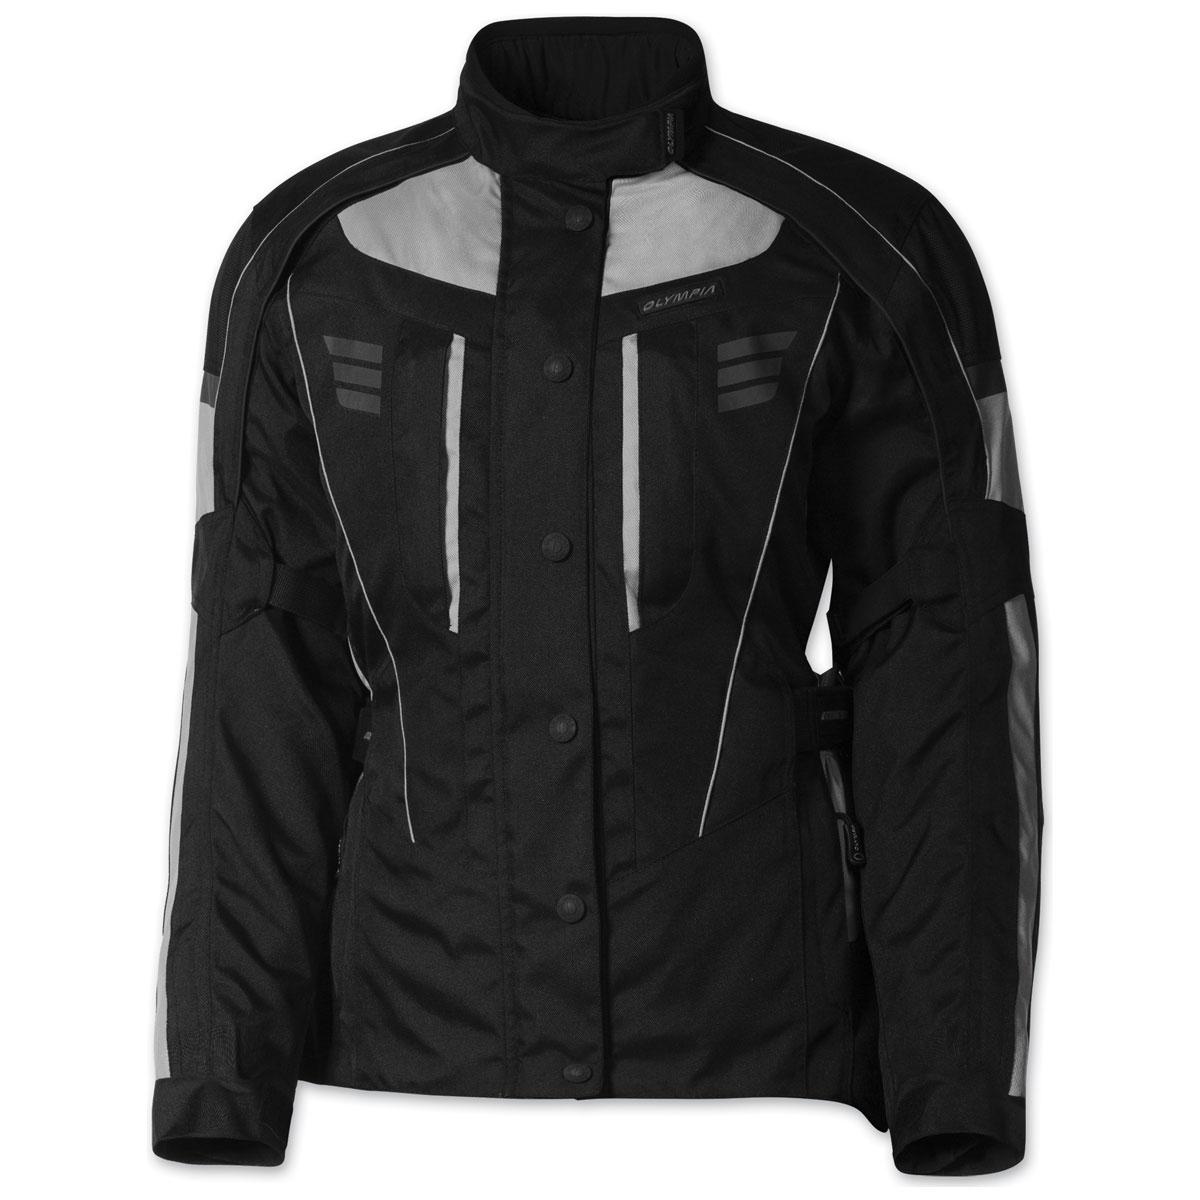 Olympia Moto Sports Women's Durham Silver Jacket